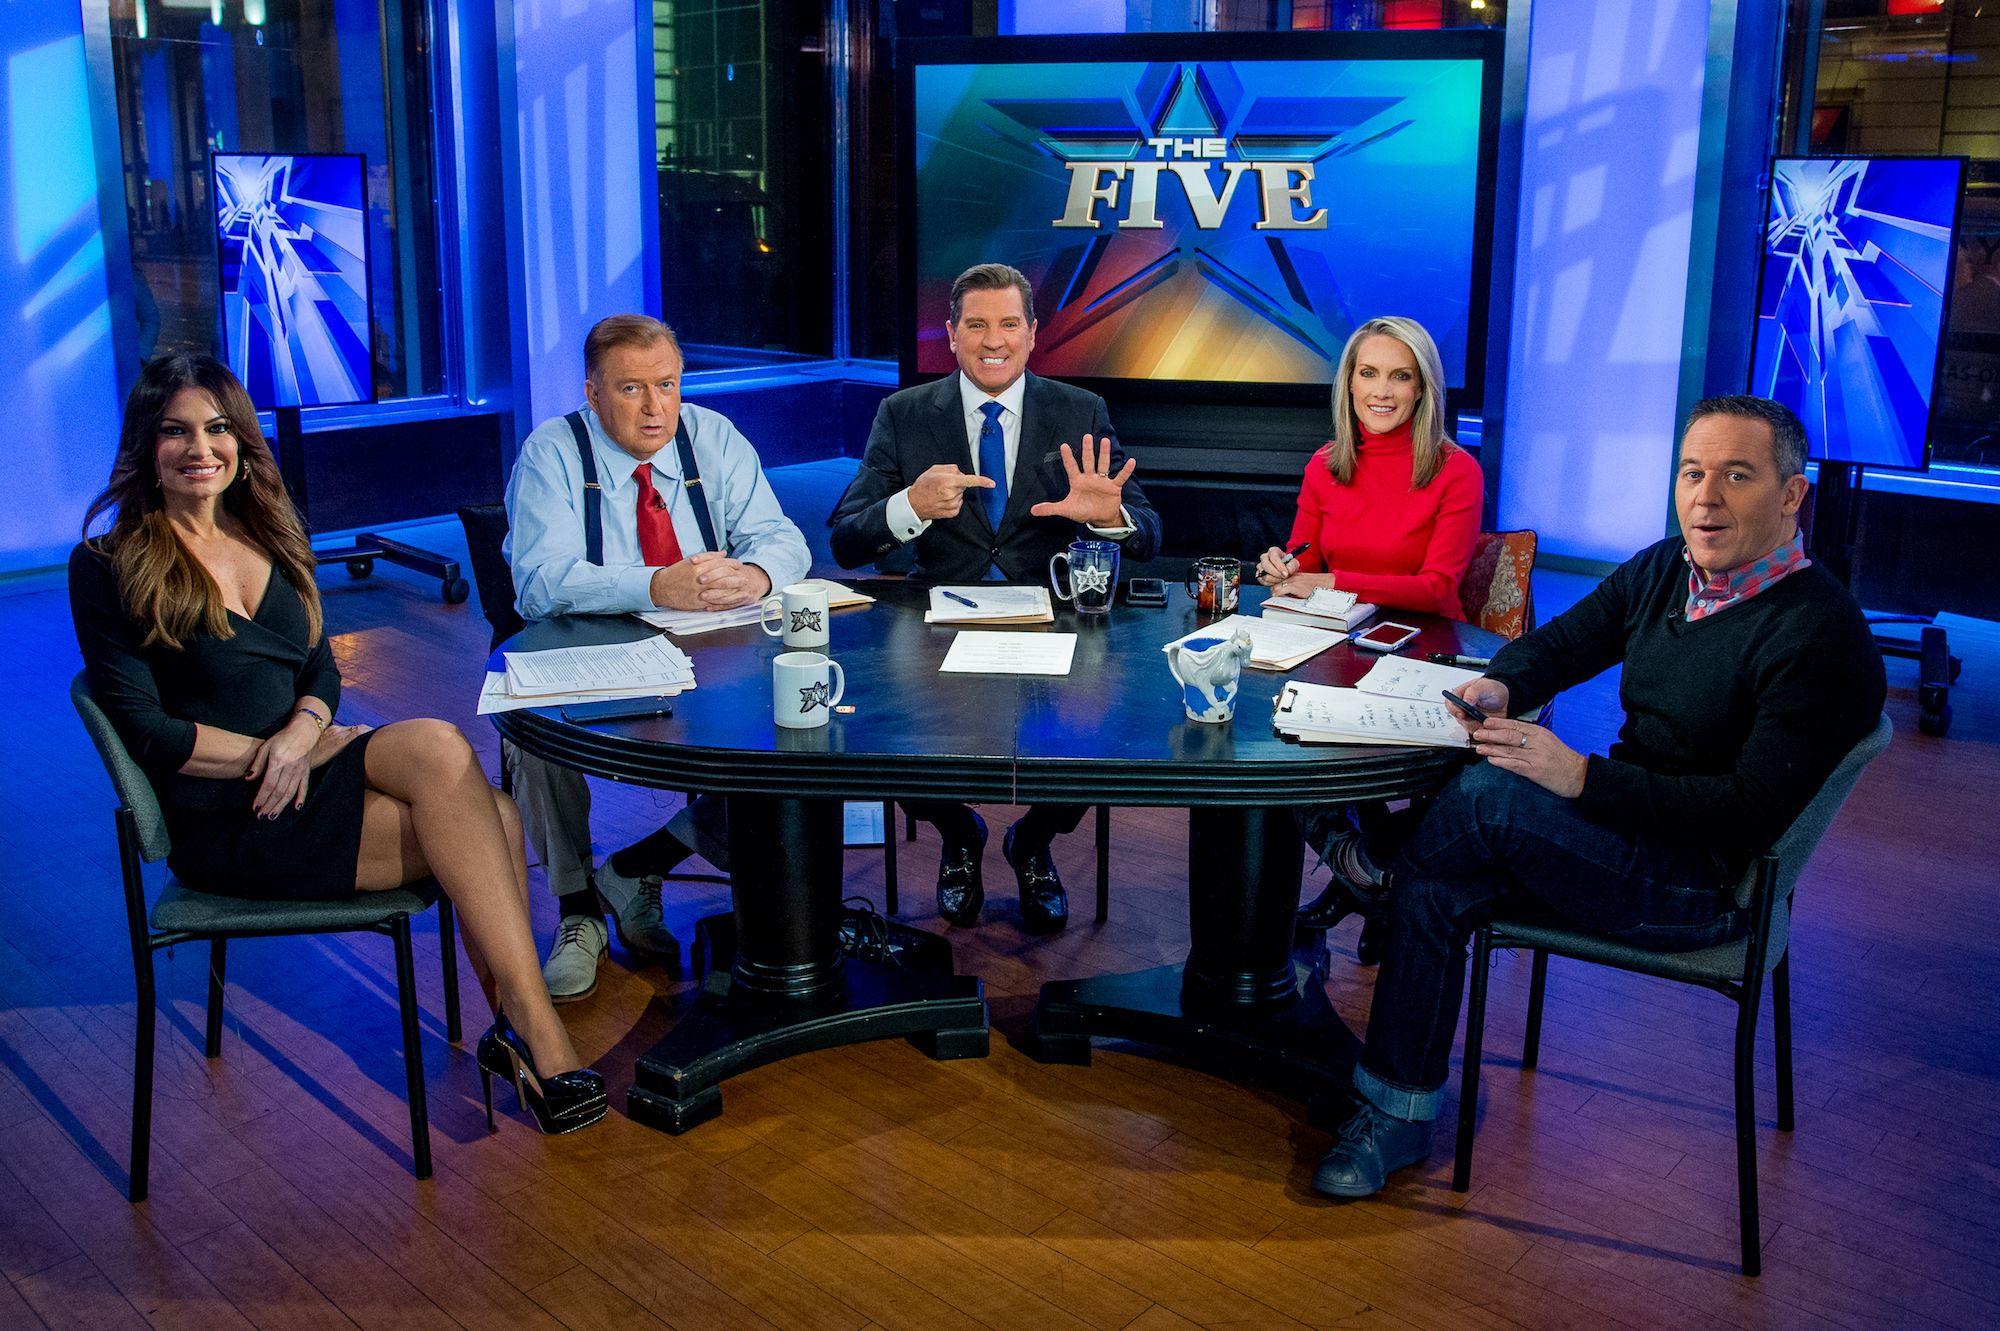 Kimberly Guilfoyle, Bob Beckel, Eric Bolling, Dana Perino and Greg Gutfeld sit on the panel of Fox News Channel's 'The Five', January 17, 2017.